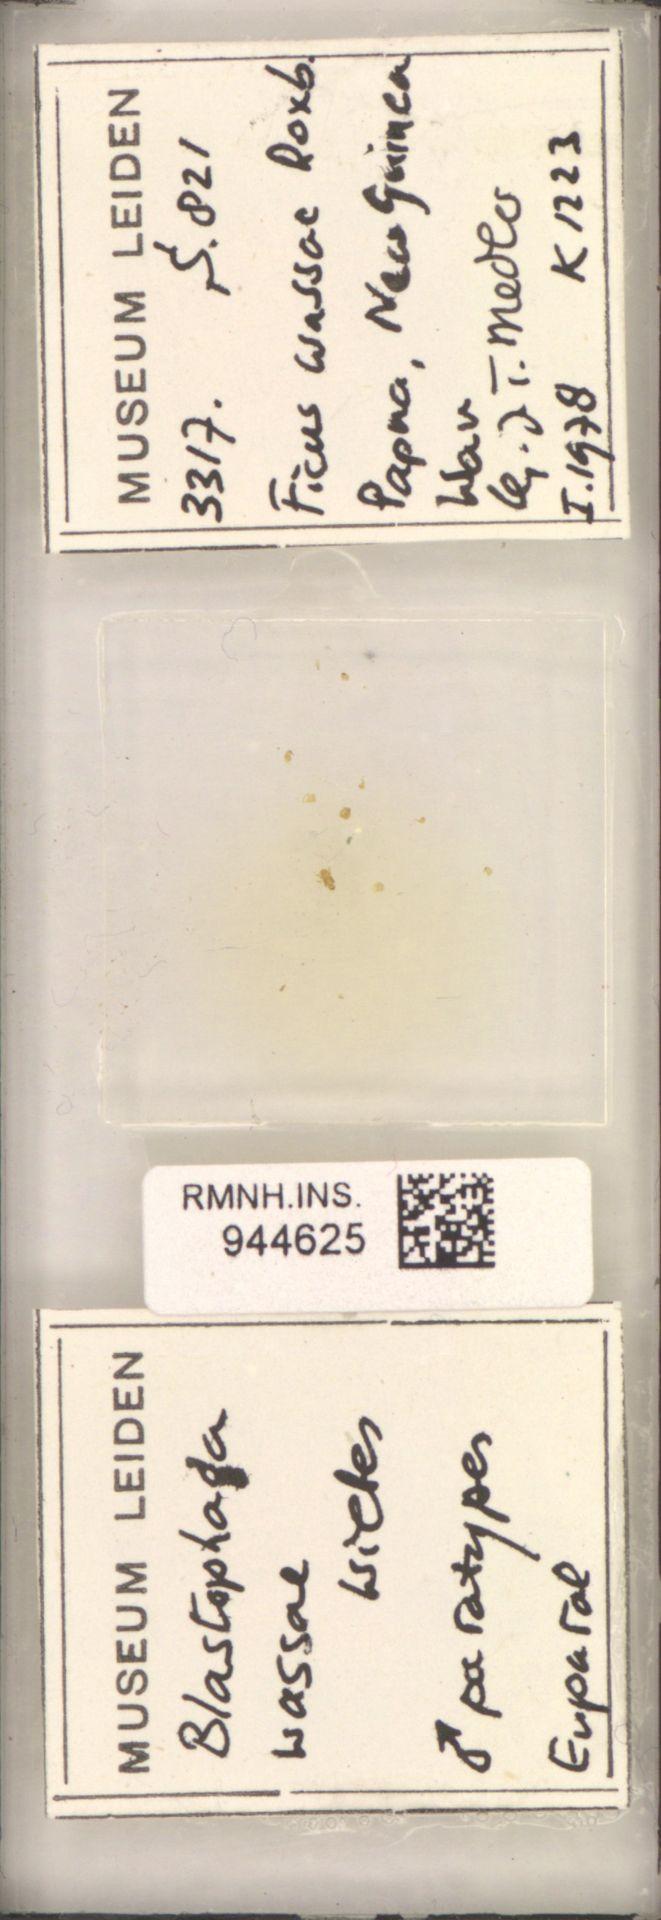 RMNH.INS.944625 | Blastophaga wassae Wiebes